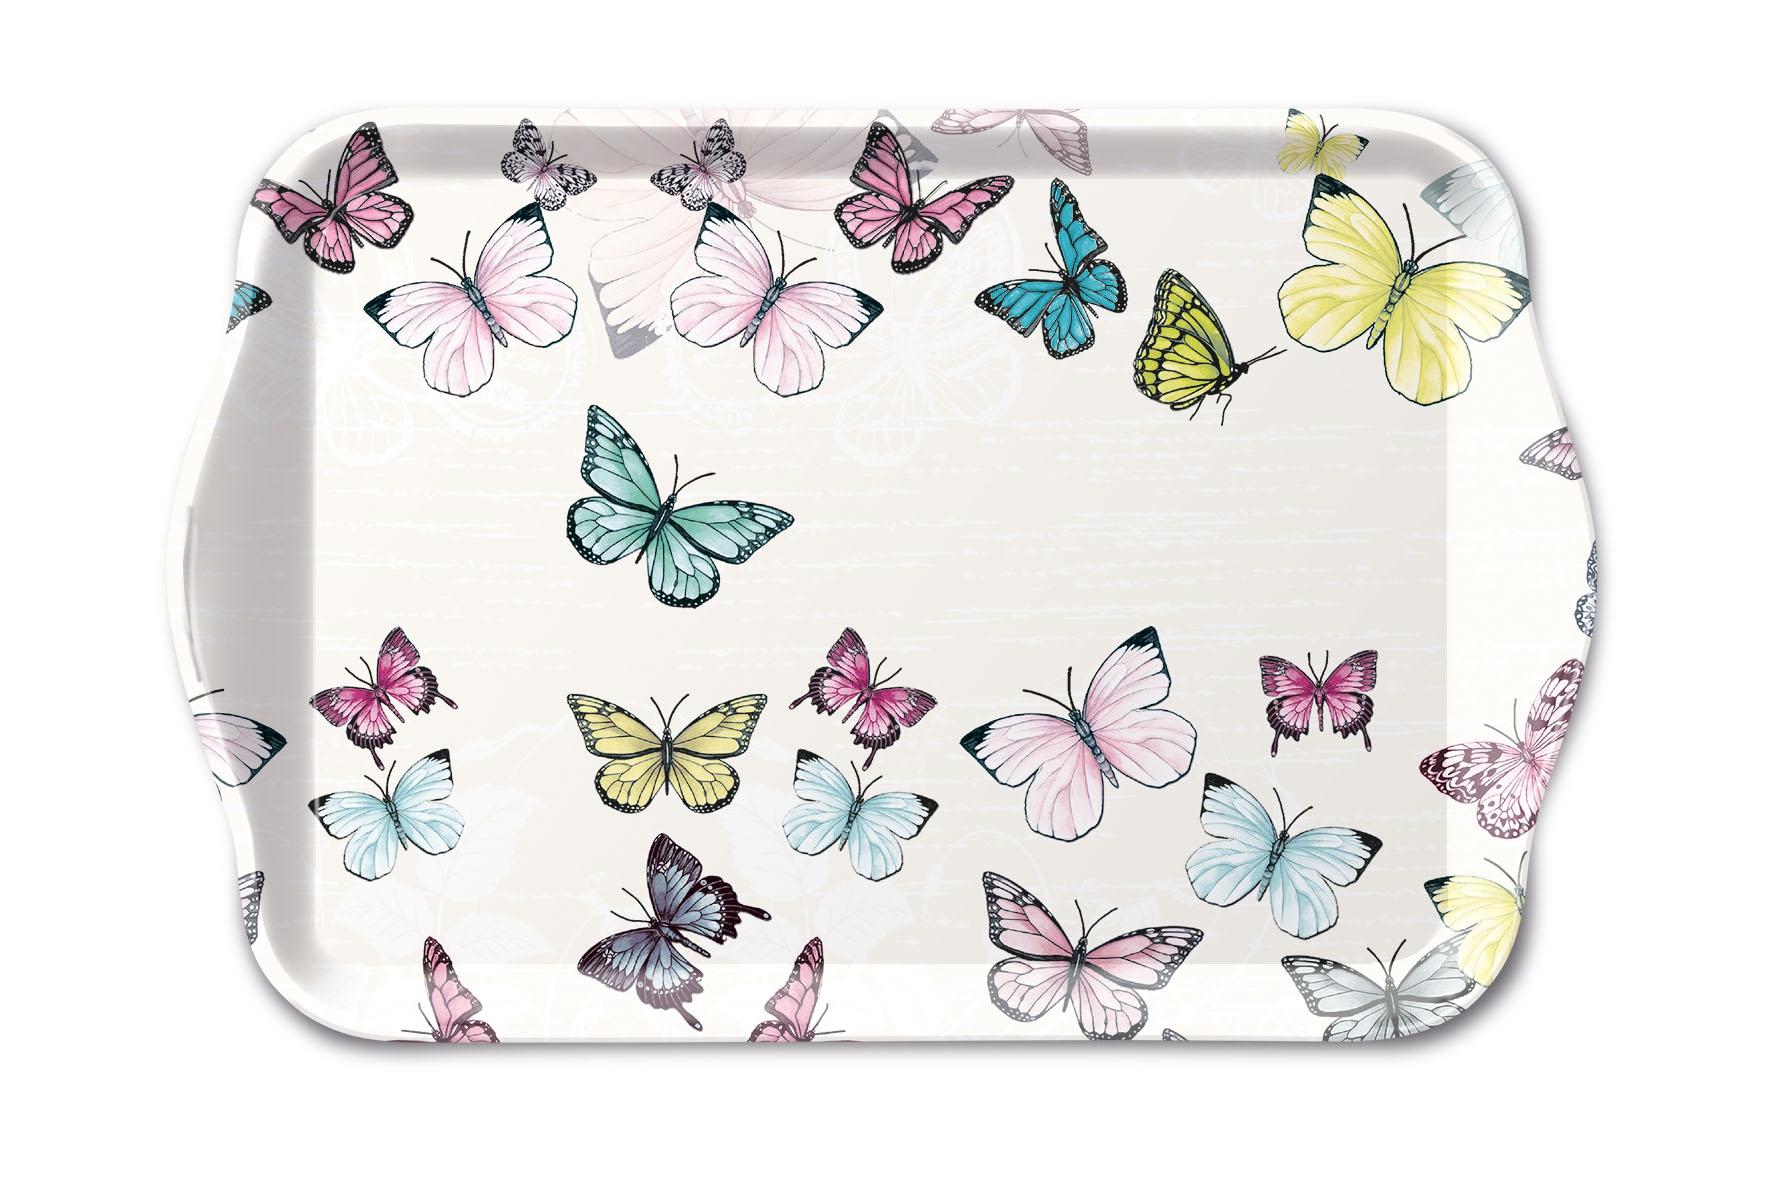 tray - Butterfly